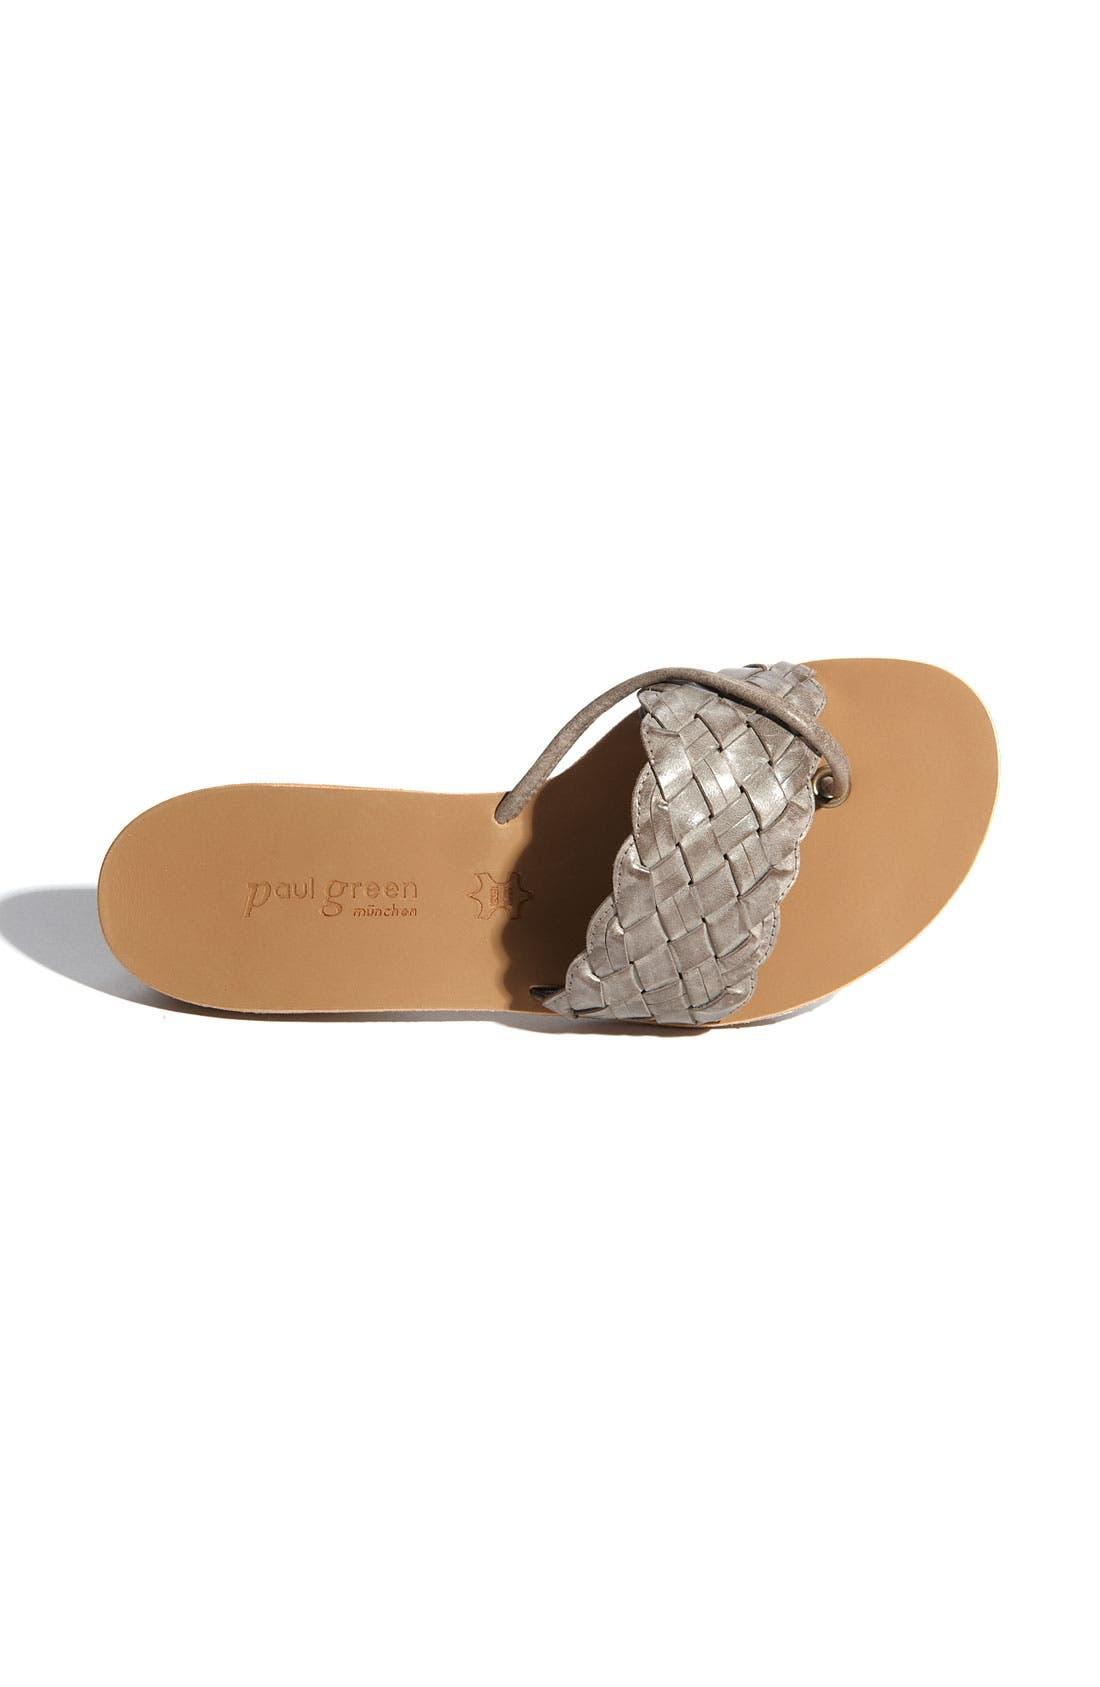 Alternate Image 3  - Paul Green 'Lulu' Sandal